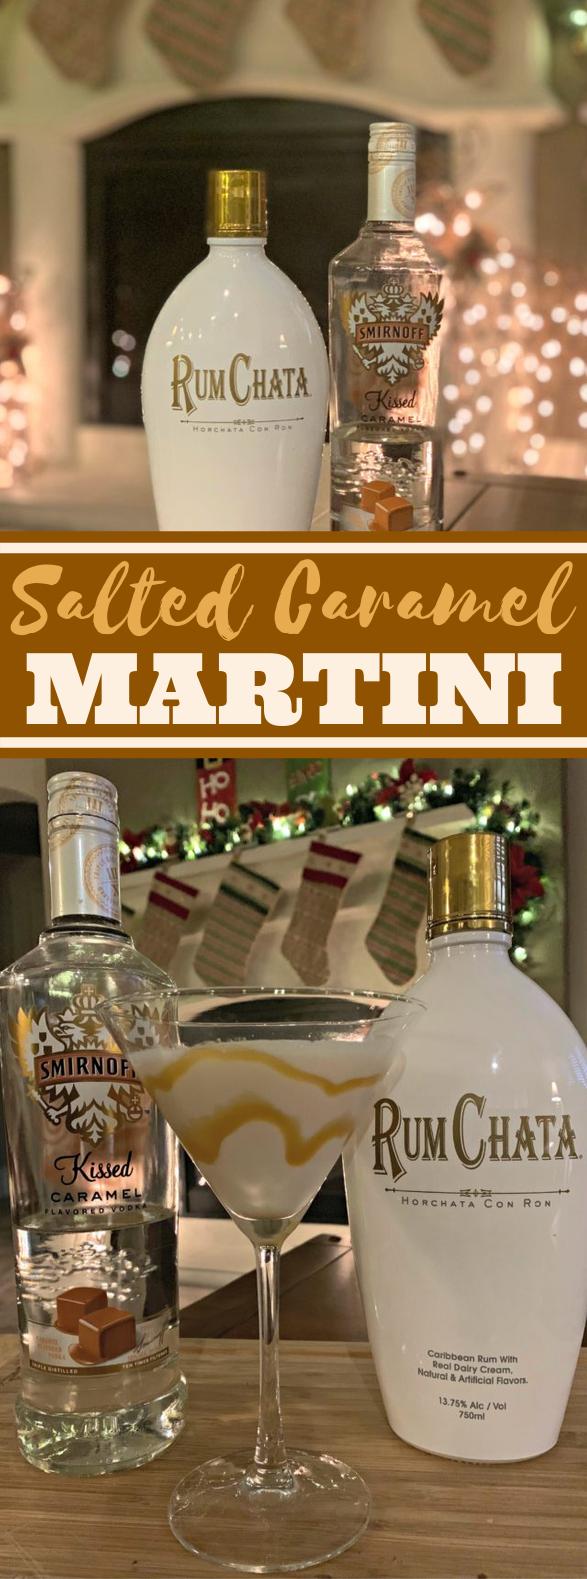 Salted Caramel Martini #drinks #alcohol #christmas #cocktails #beverages